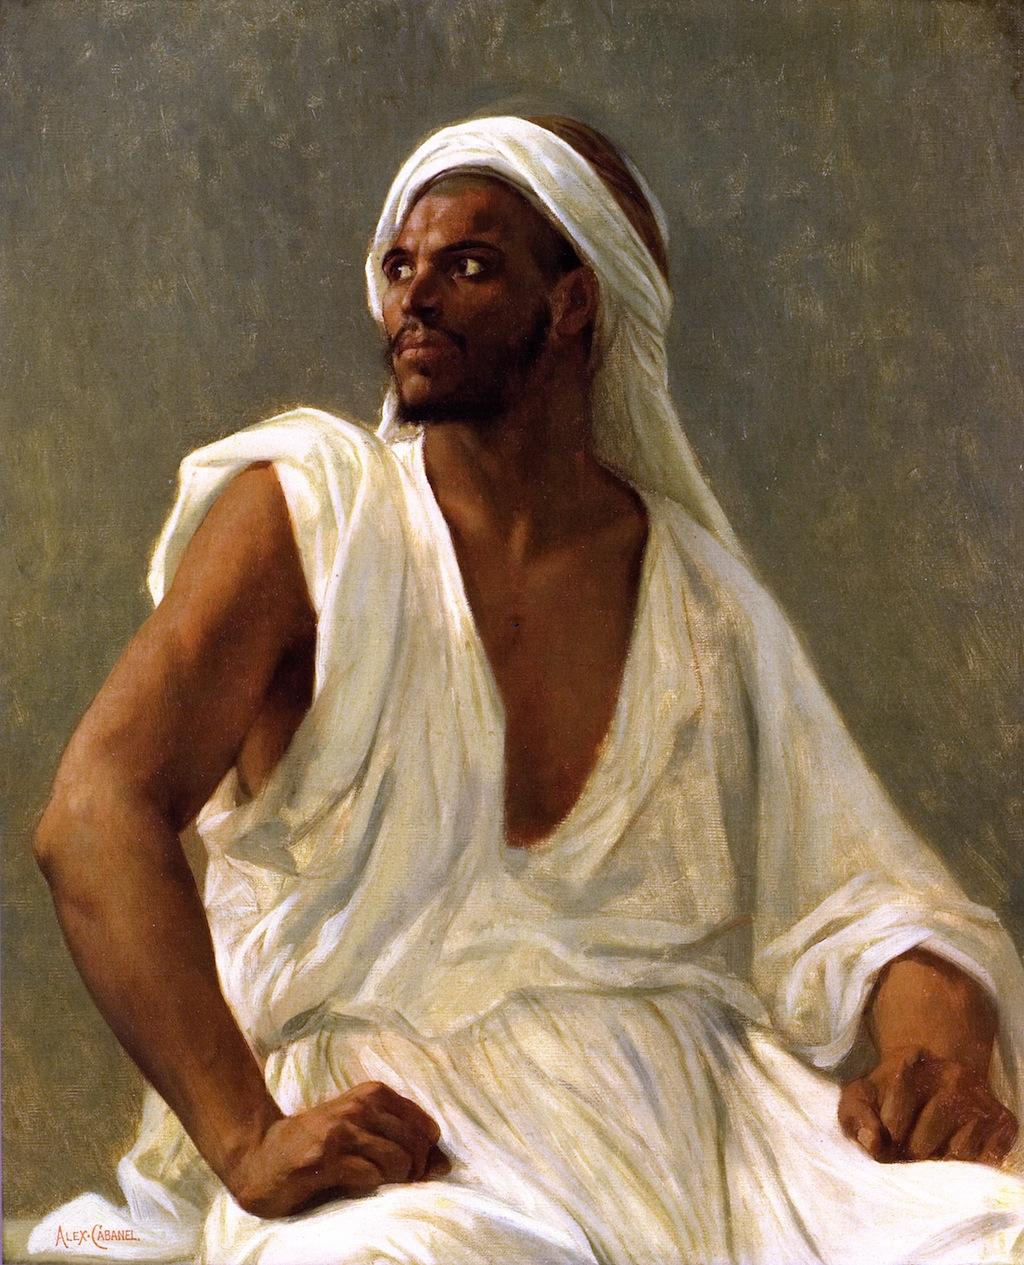 Alexandre-Cabanel-xx-Portrait-of-an-Arab-